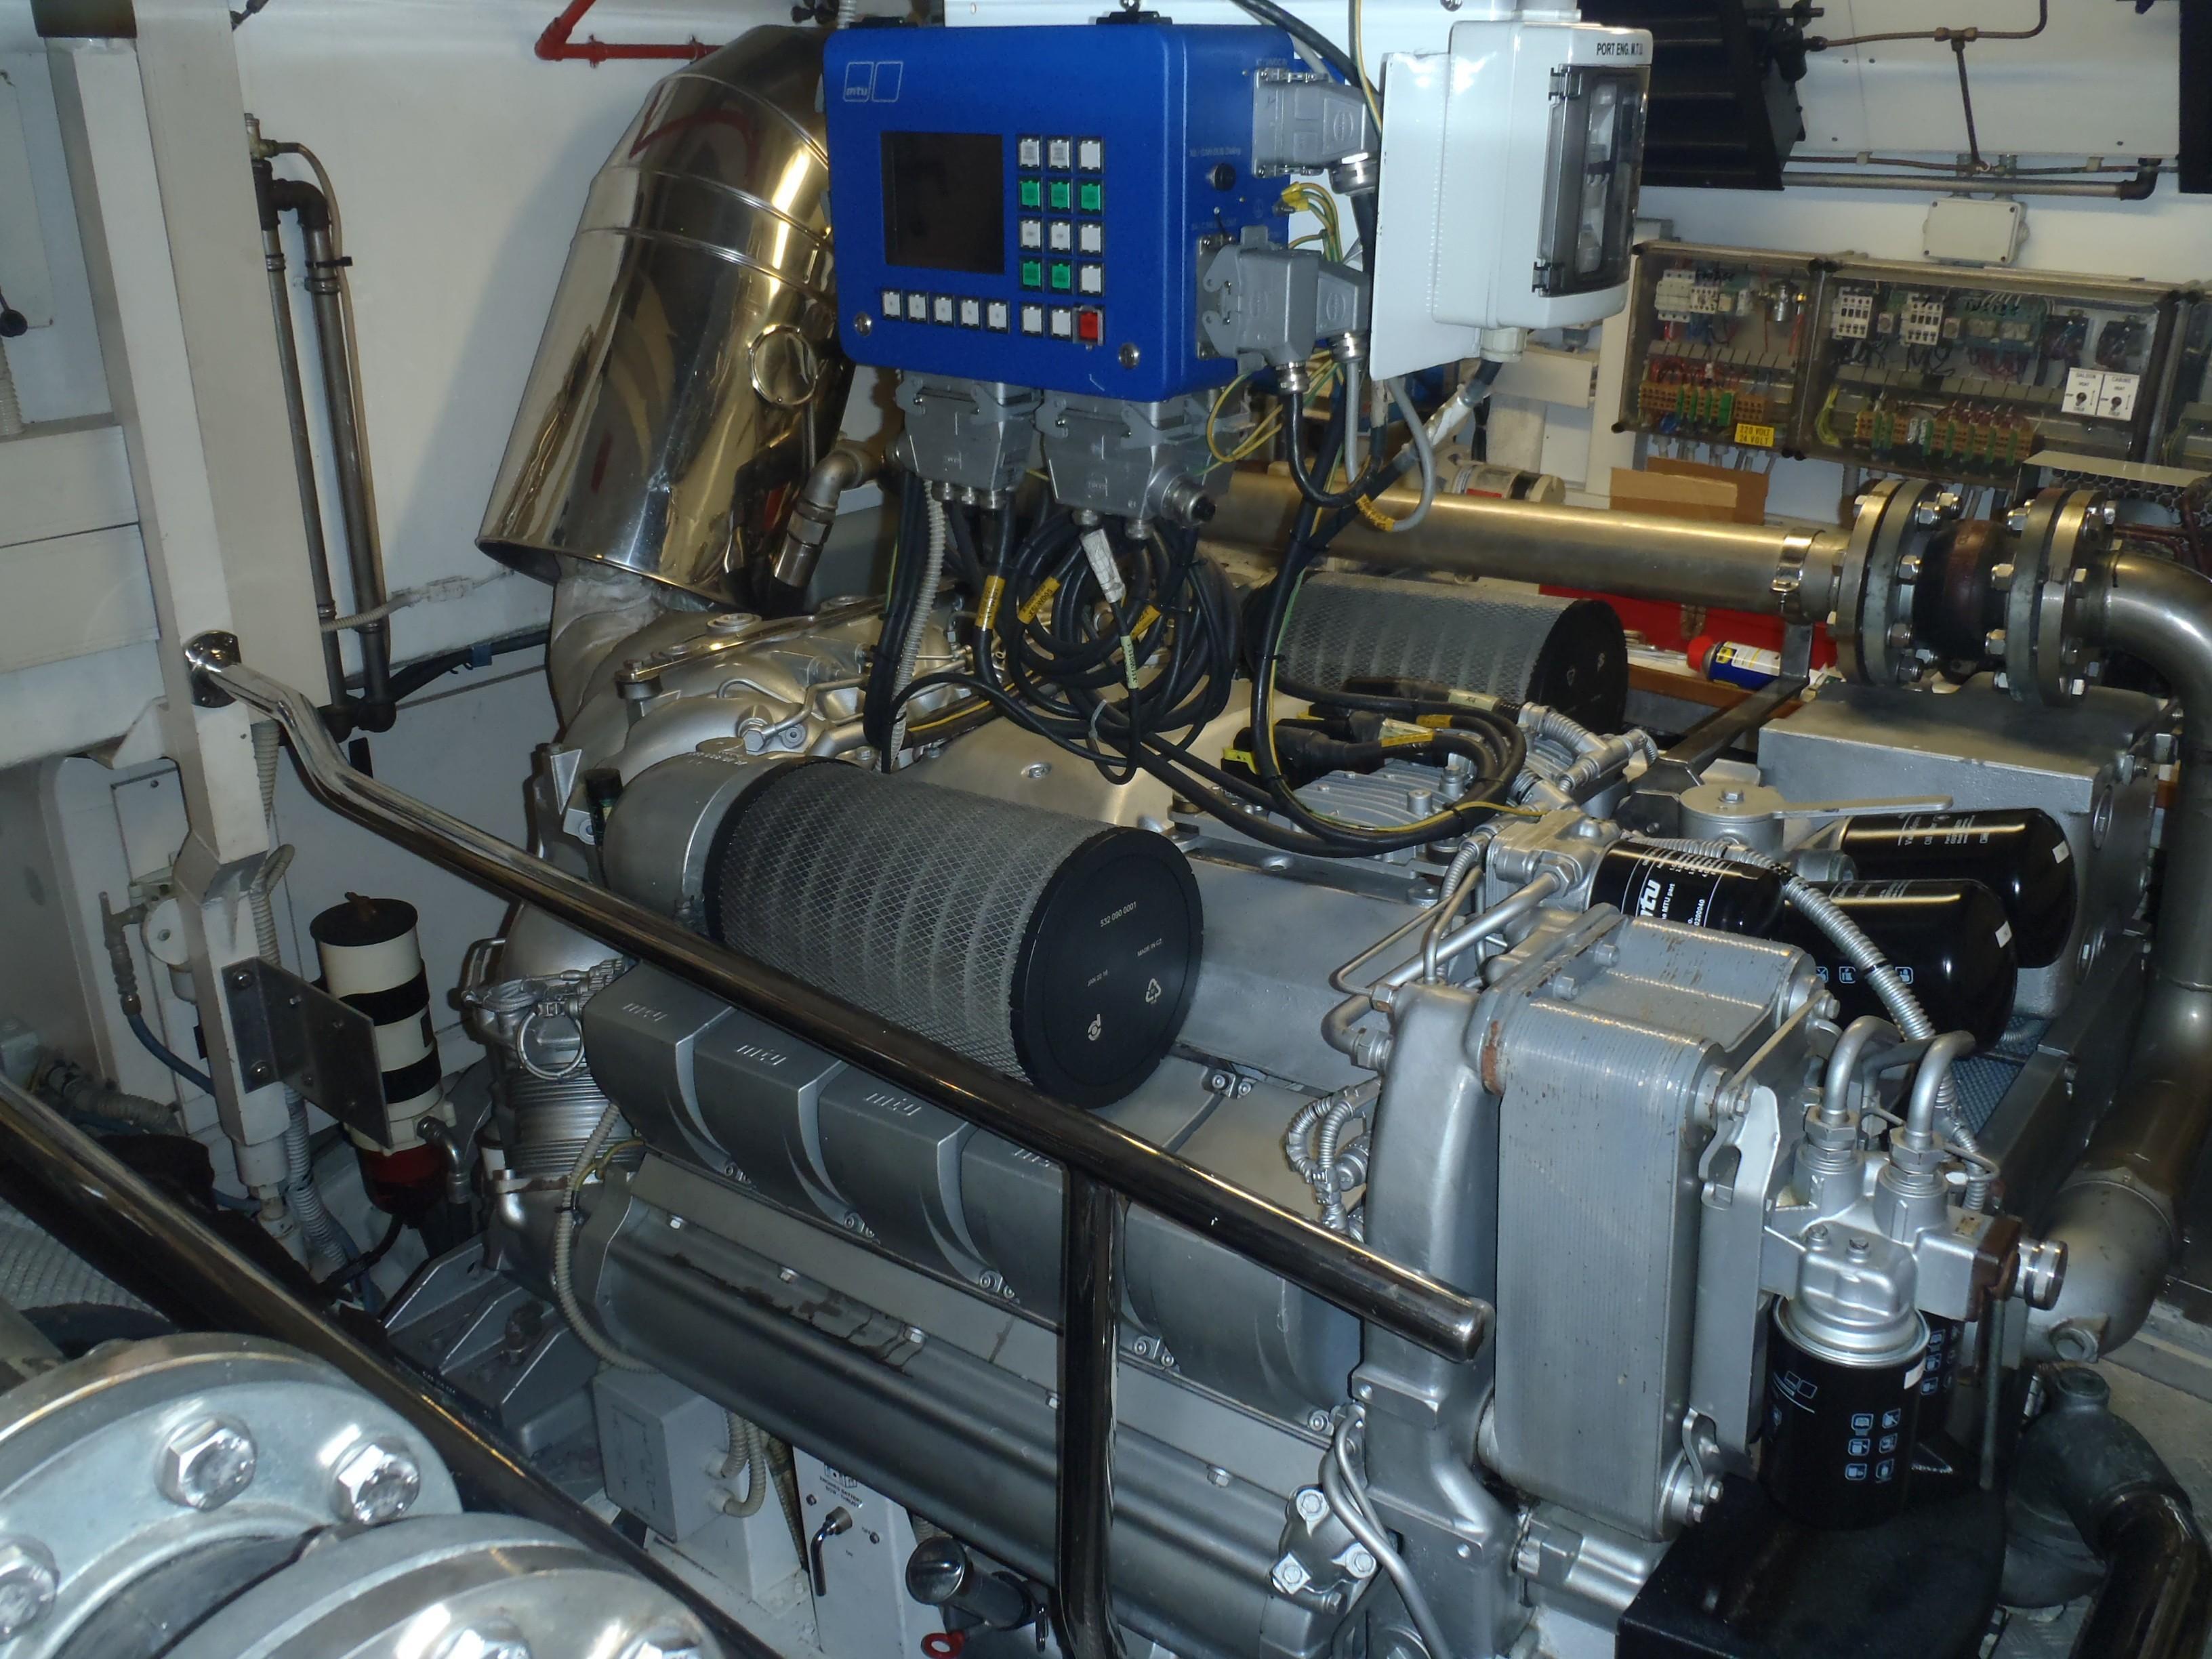 Port MTU M-93 1500